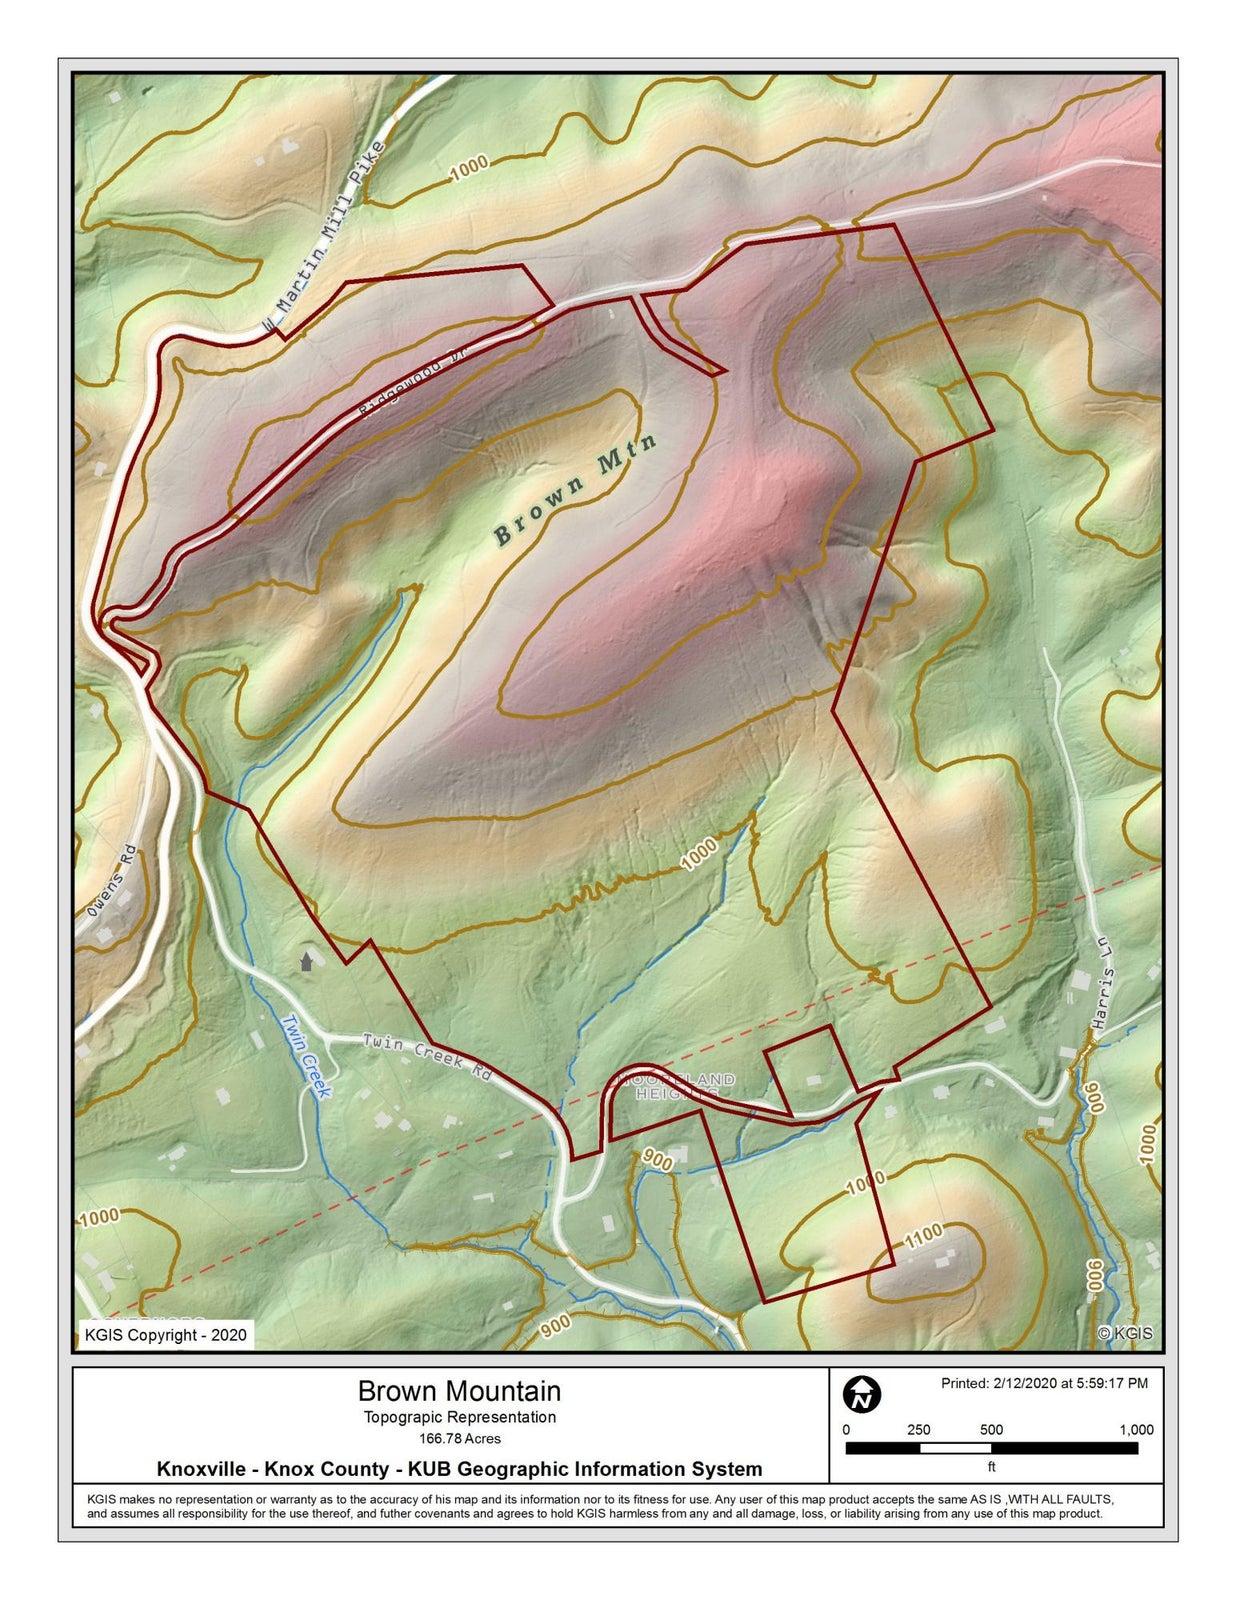 Topographic Representation